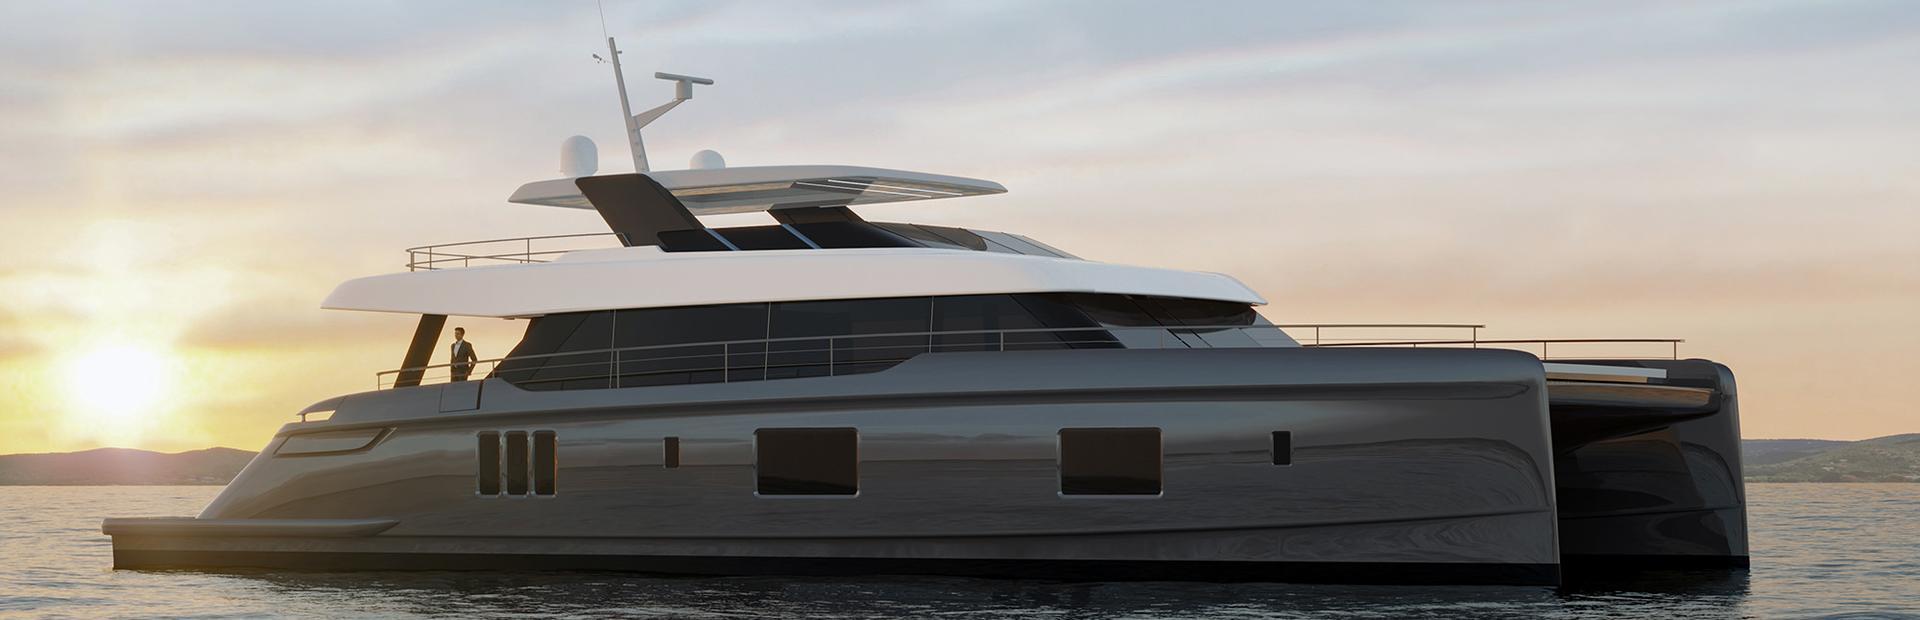 100 Sunreef Power Yacht Charter